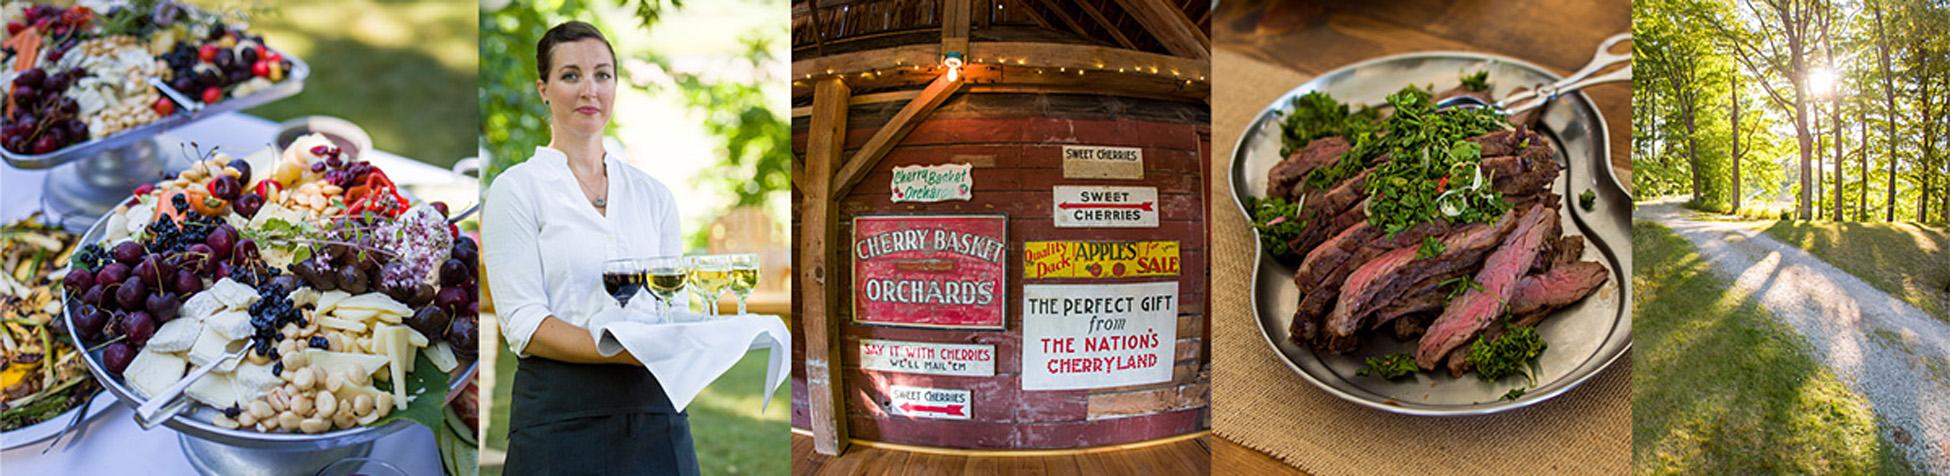 Cherry Basket Farm by wedding Photographer Thomas Kachadurian